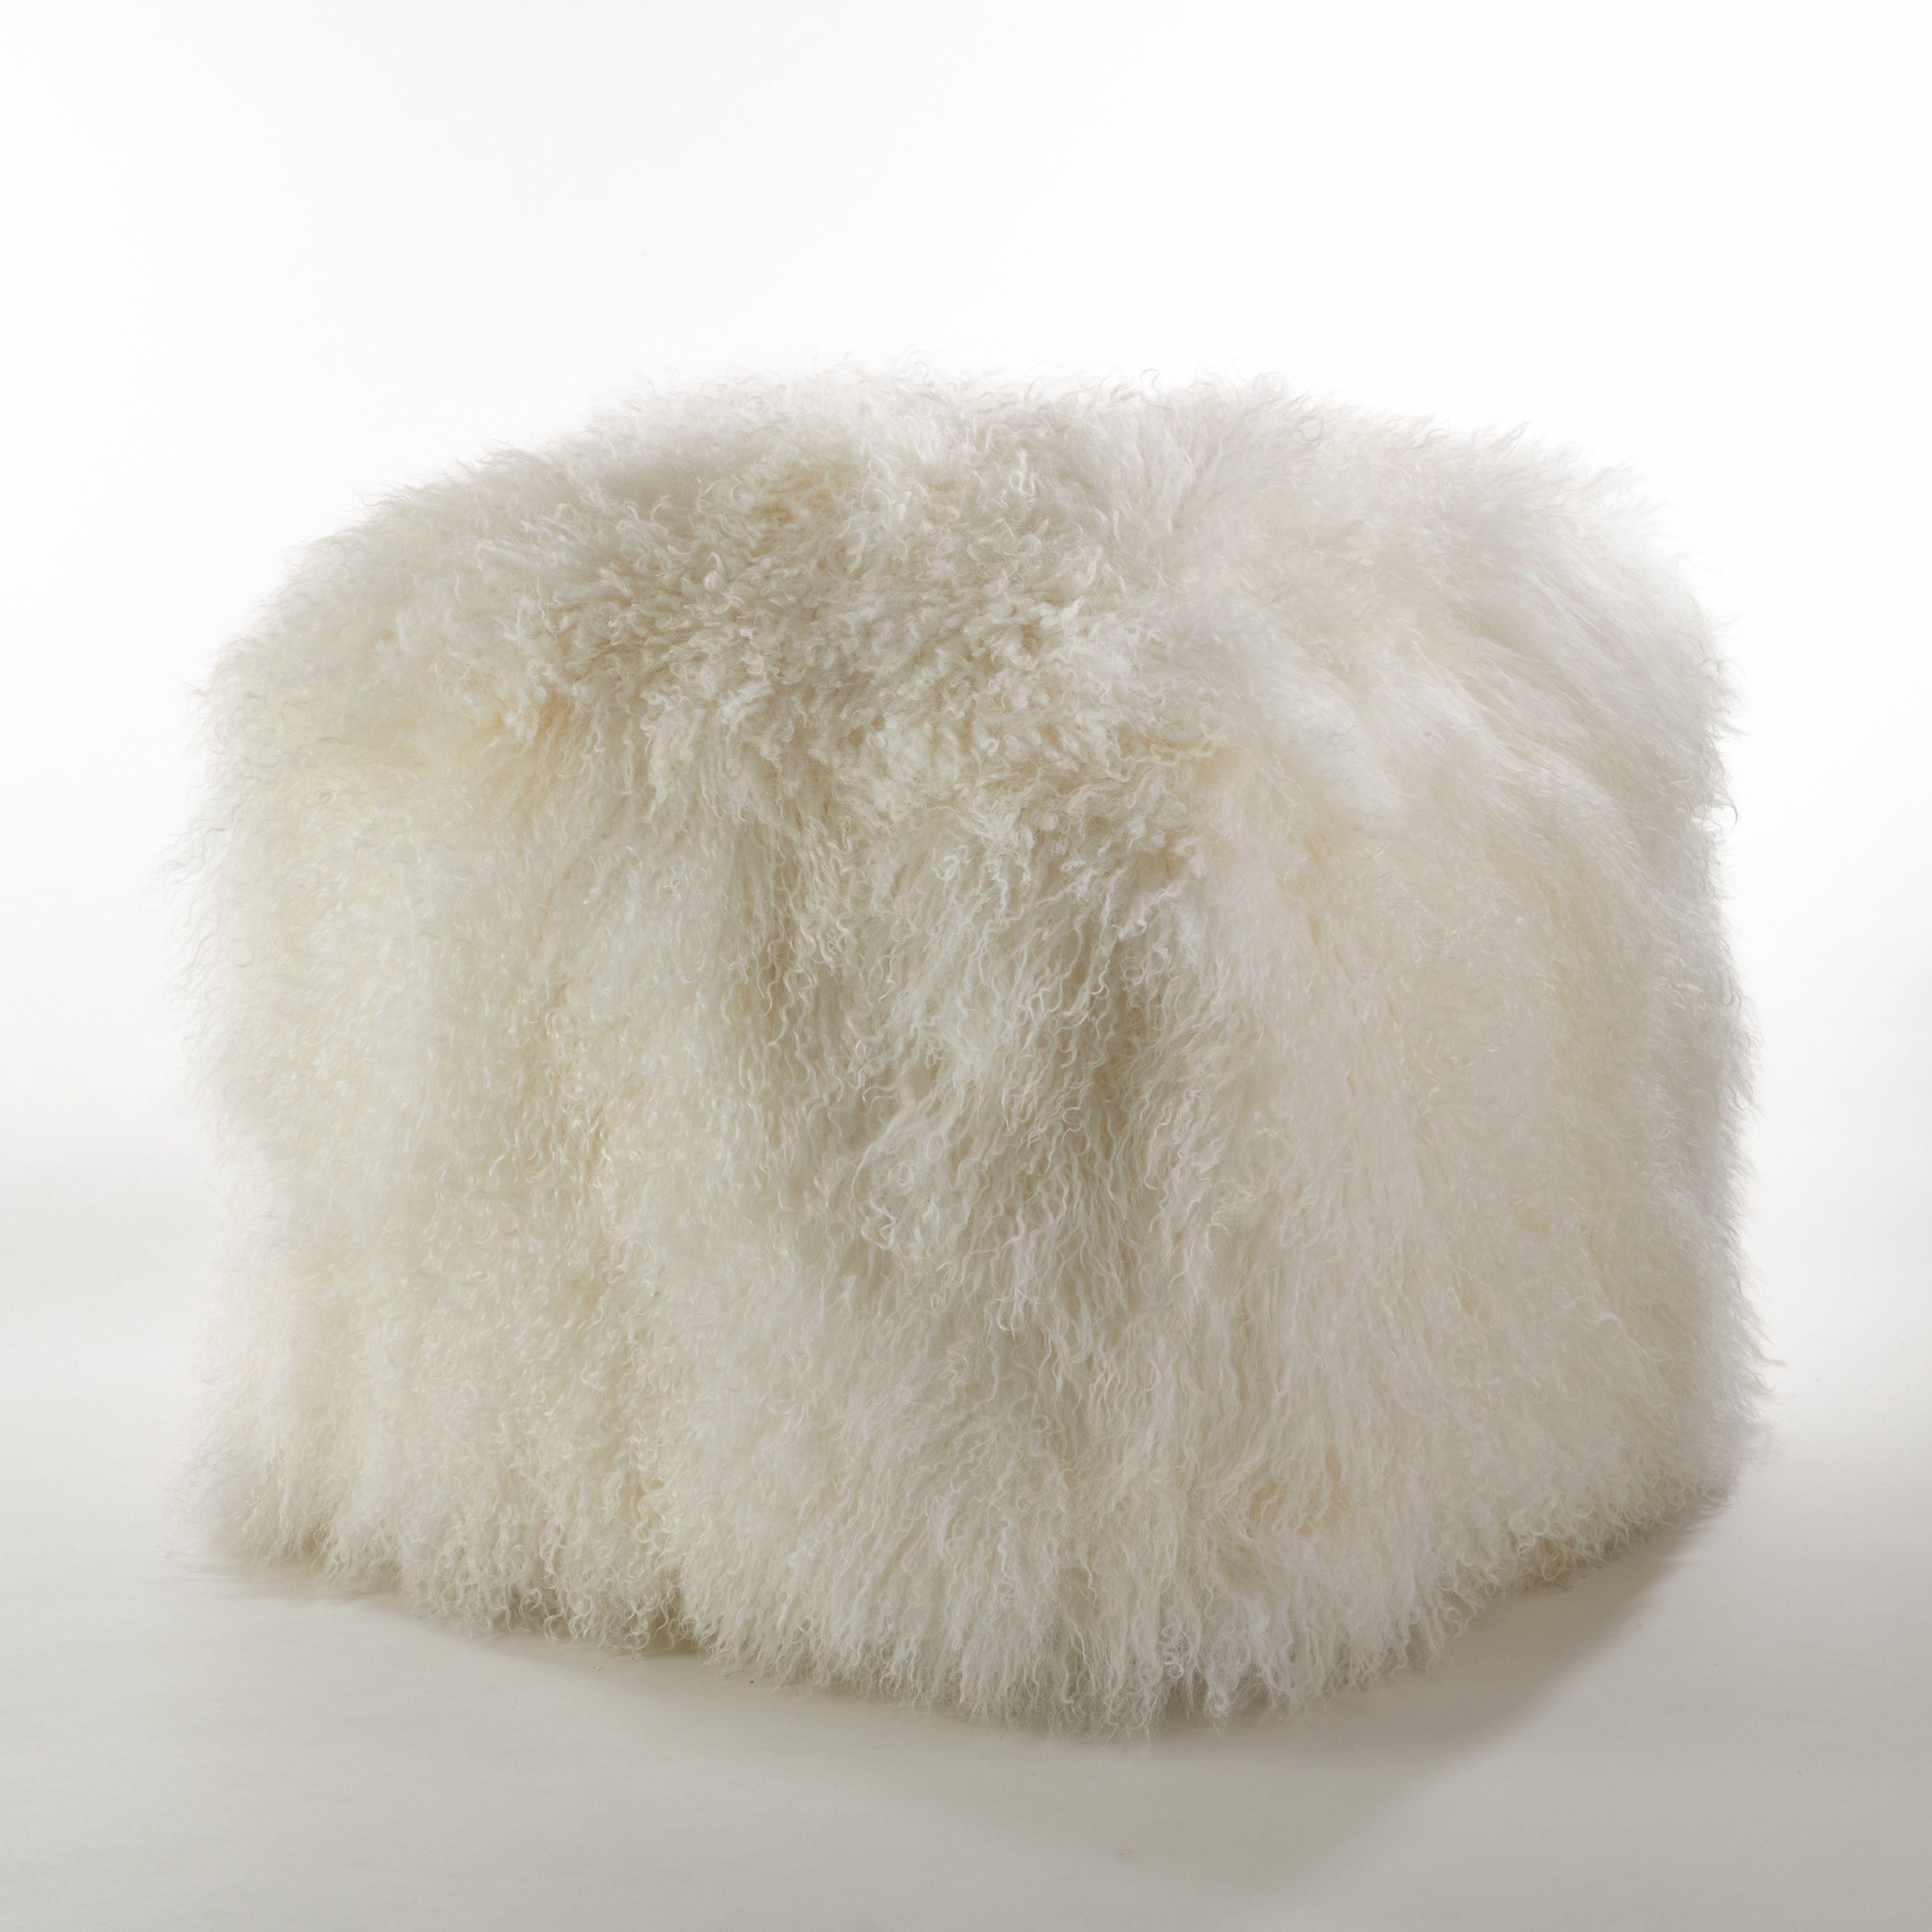 Saro Mongolian Lamb Fur Wool Pouf Ottoman Ivory 18 Inches In Diameter X High Size